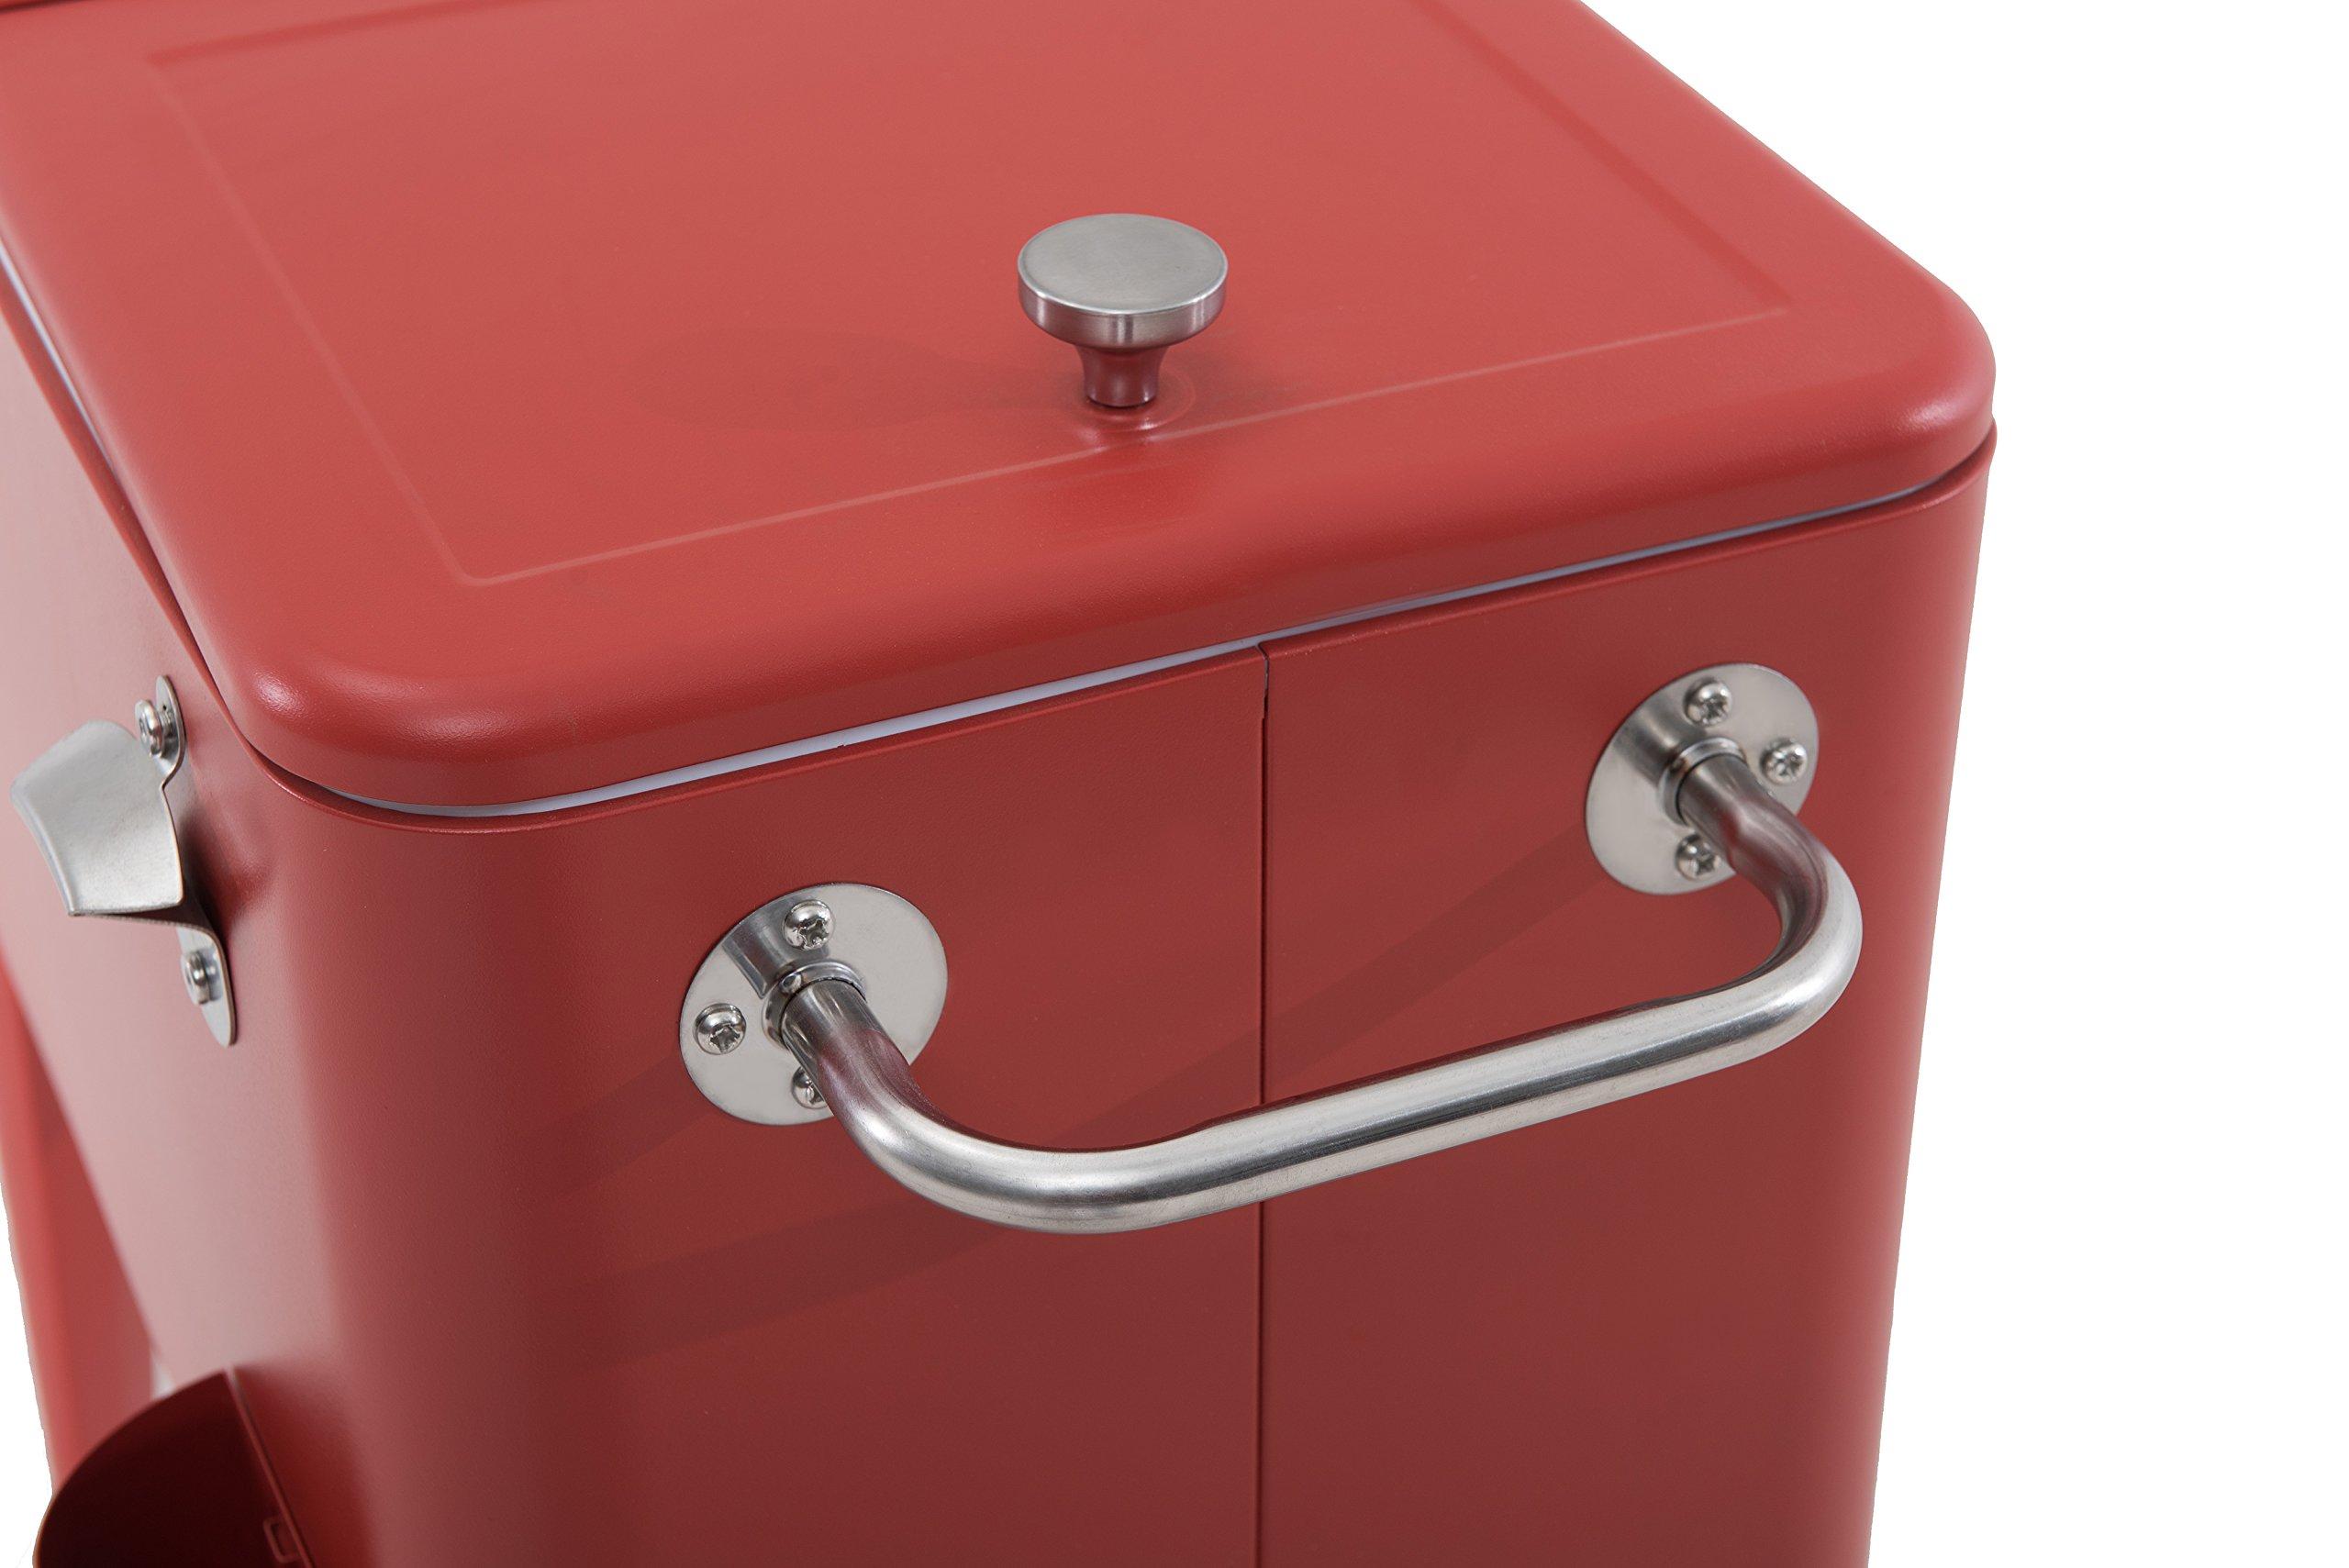 Sunjoy L-BC153PST 60 quart Wheeled Beverage Cooler in Red by sunjoy (Image #8)